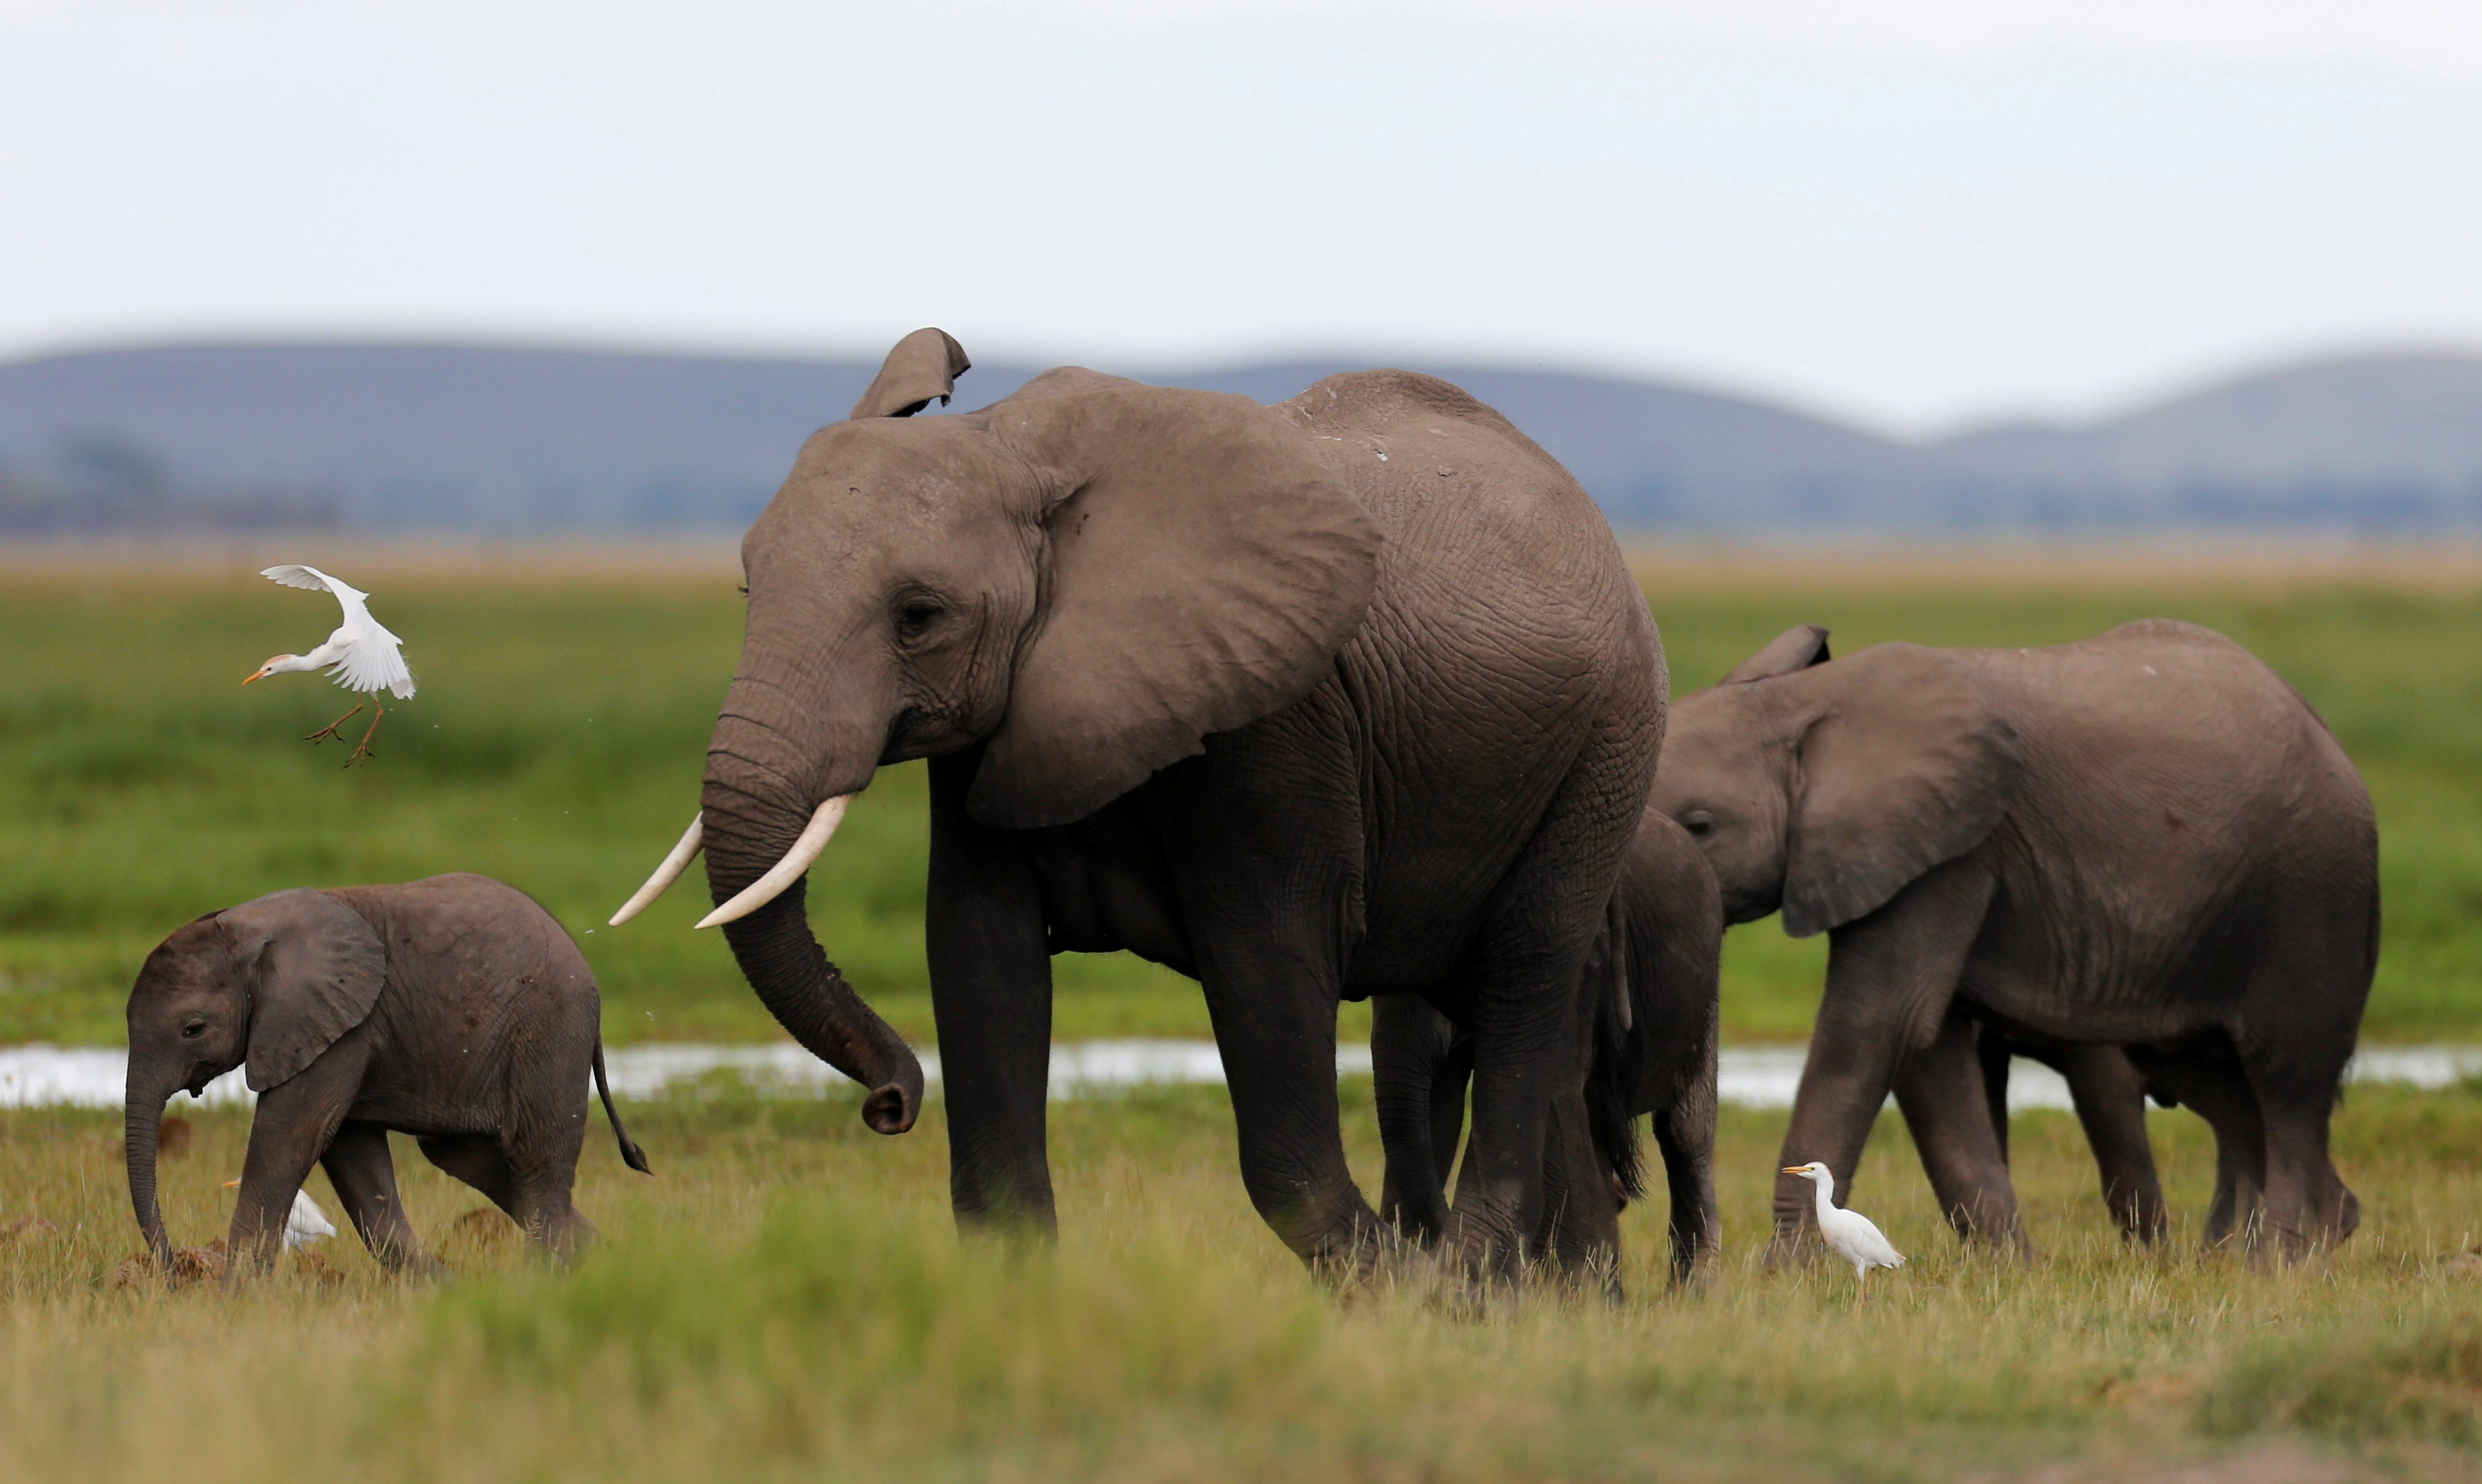 A bird flies over a family of elephants walking in the Amboseli National Park, southeast of Kenya's capital Nairobi, April 25, 2016. - RTX2BLAN